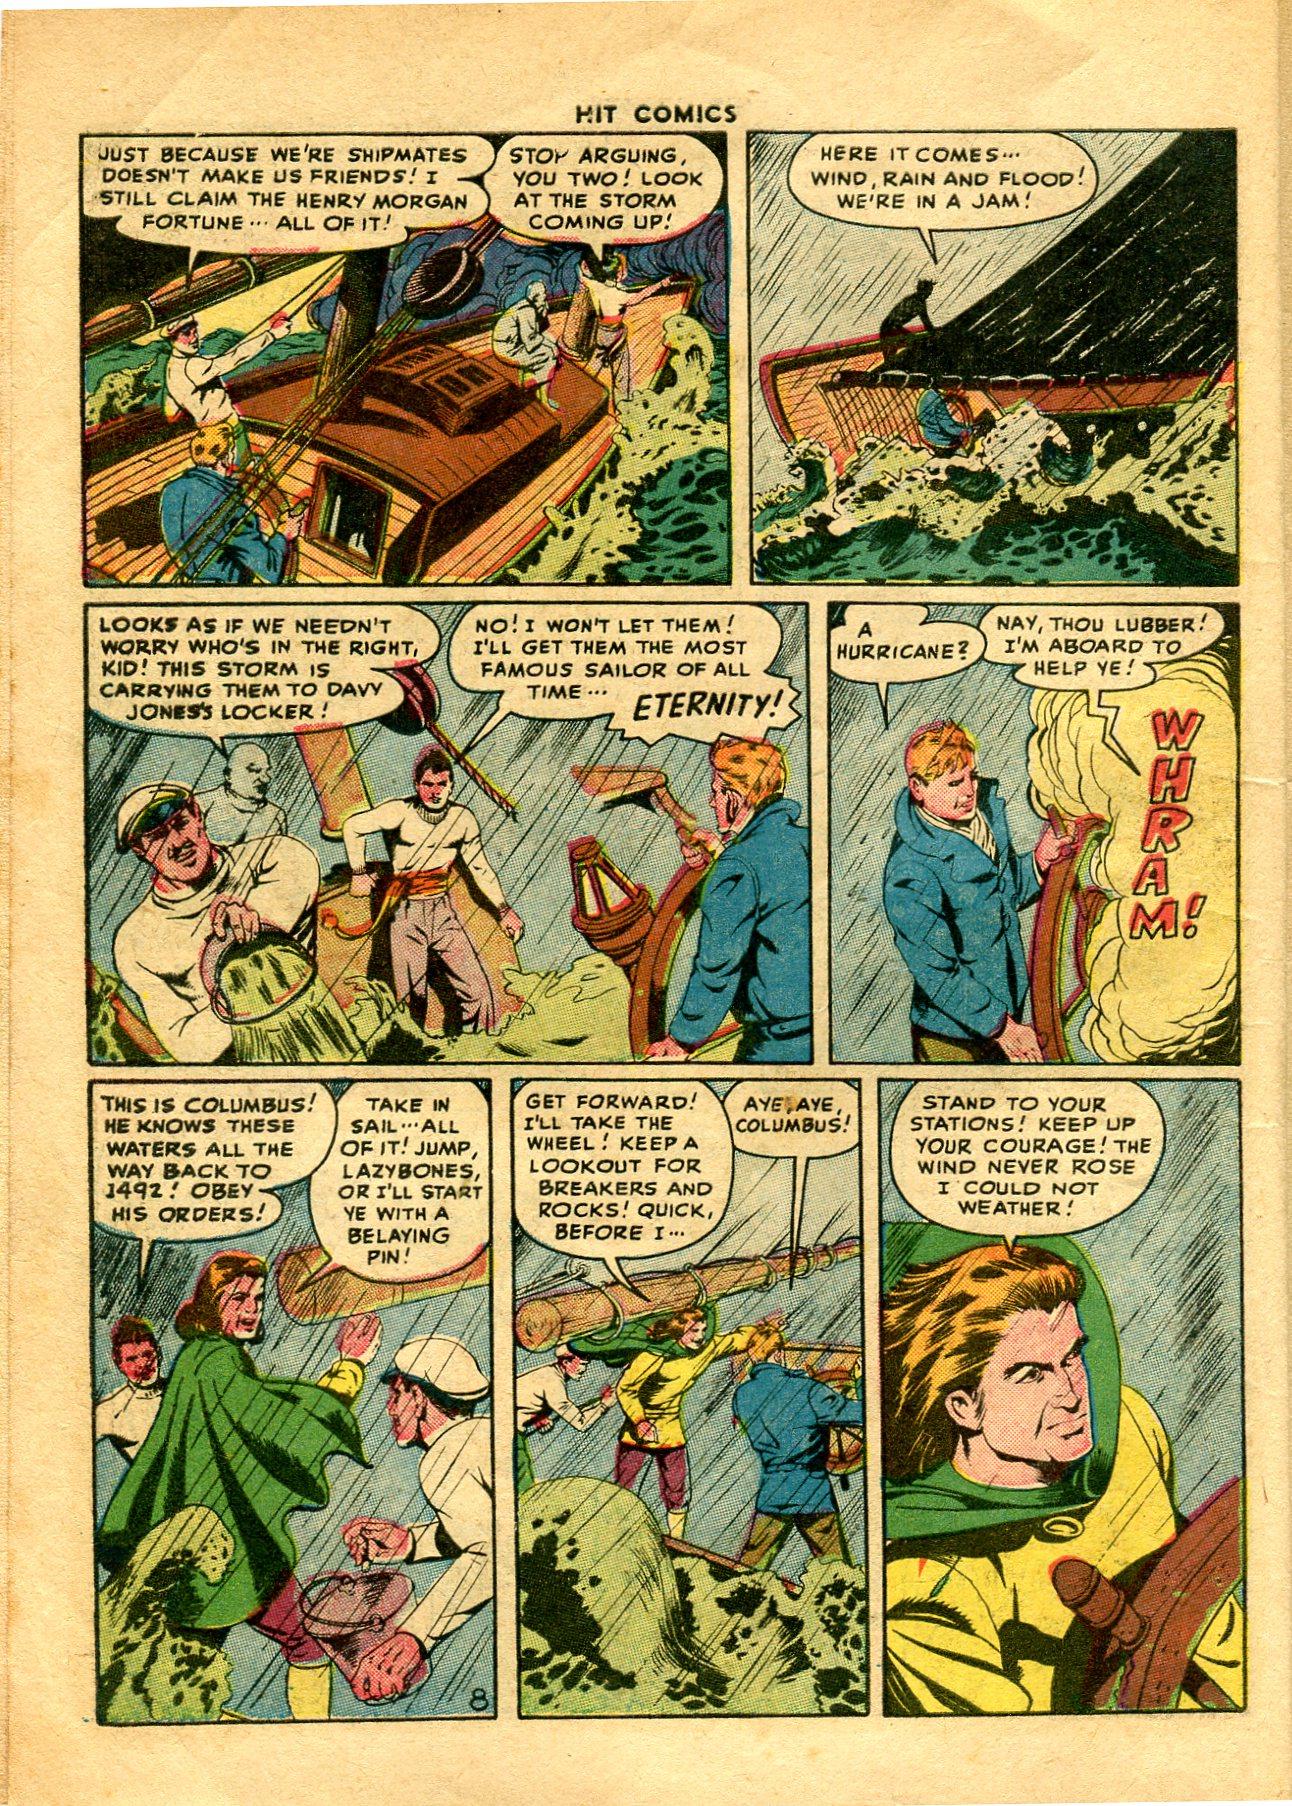 Read online Hit Comics comic -  Issue #48 - 10